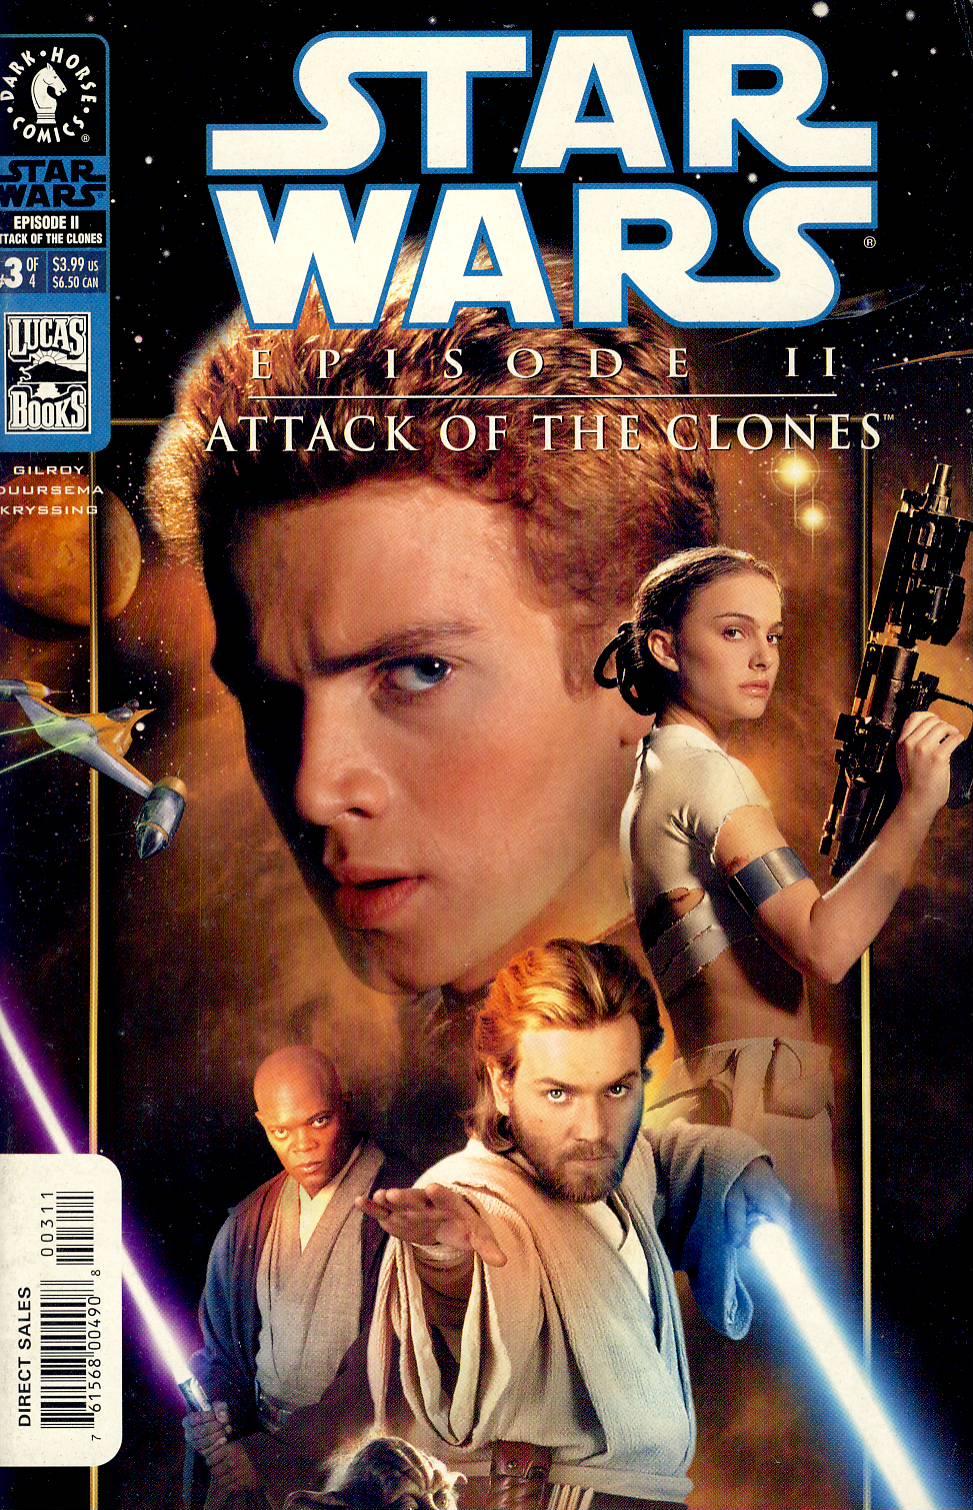 Star Wars Episode II Attack of the Clones Comic VGC ref101562 Dark Horse Comic no.3 of 4 in very good read condition.